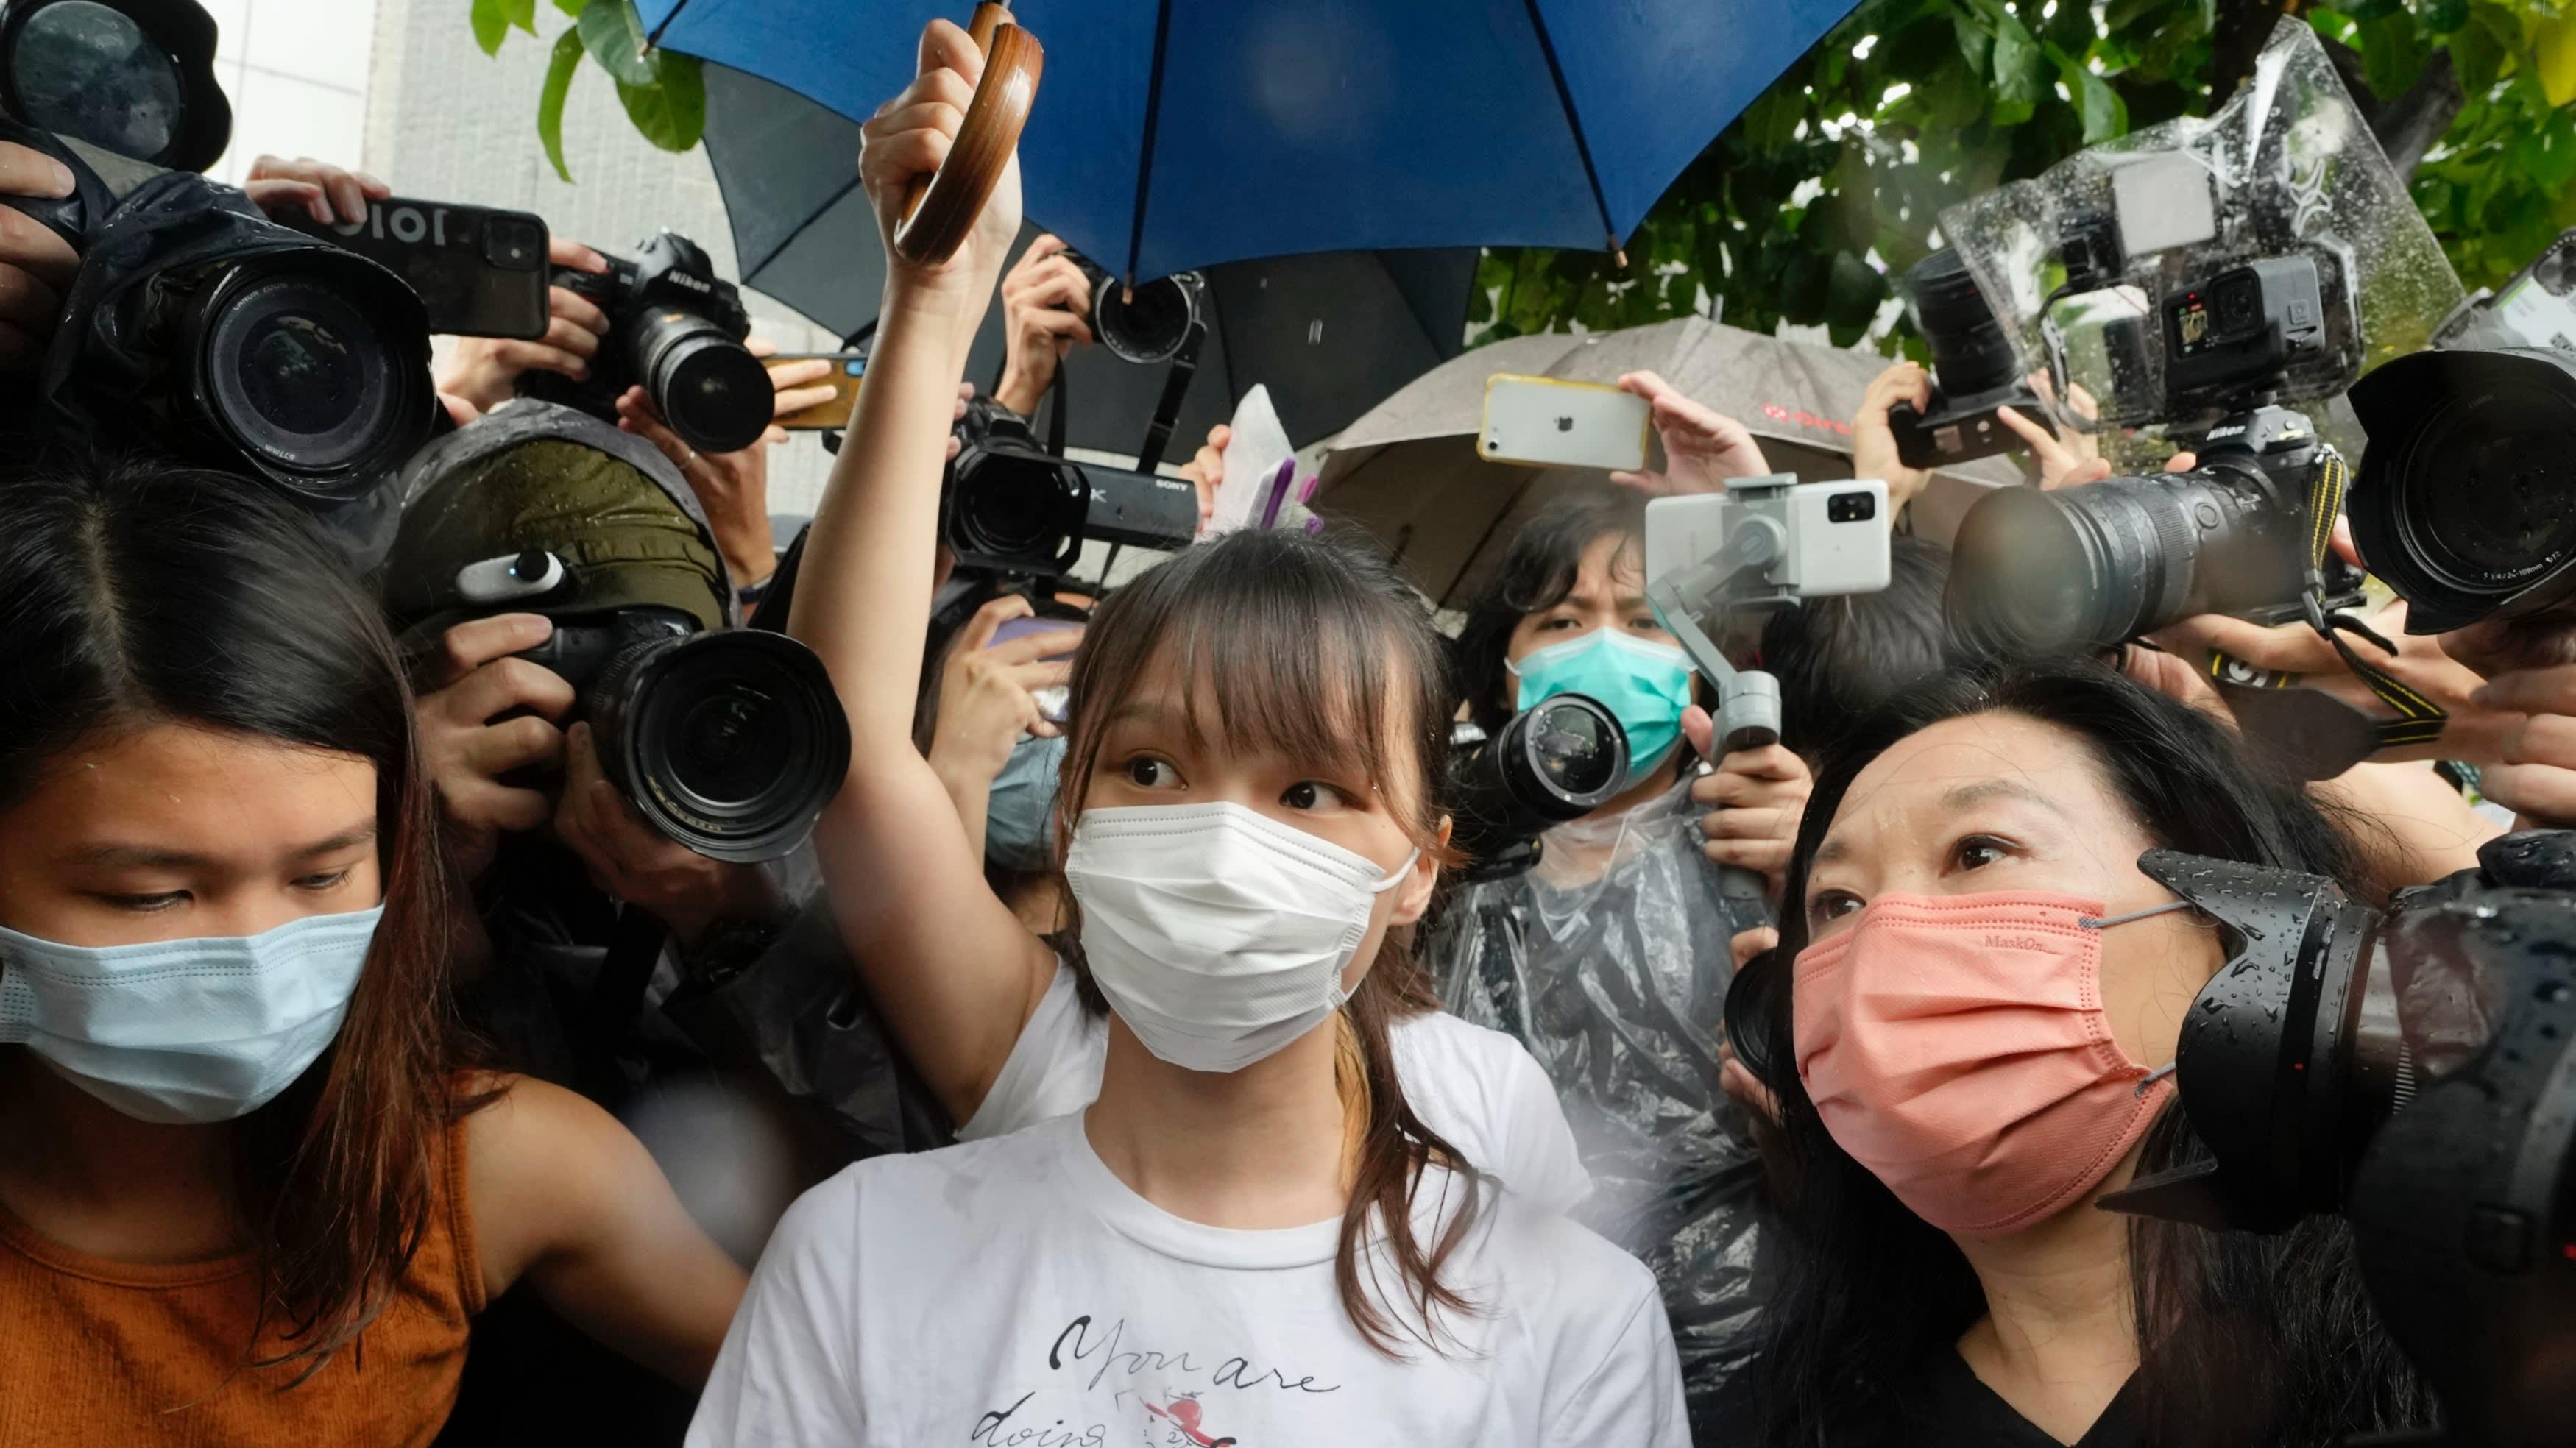 Agnes Chow released from Hong Kong prison -                         Nikkei Asia                         ArrowArtboardArtboardTitle ChevronTitle ChevronIcon FacebookIcon LinkedinIcon Mail ContactPath LayerIcon MailPositive ArrowIcon PrintIcon Twitter